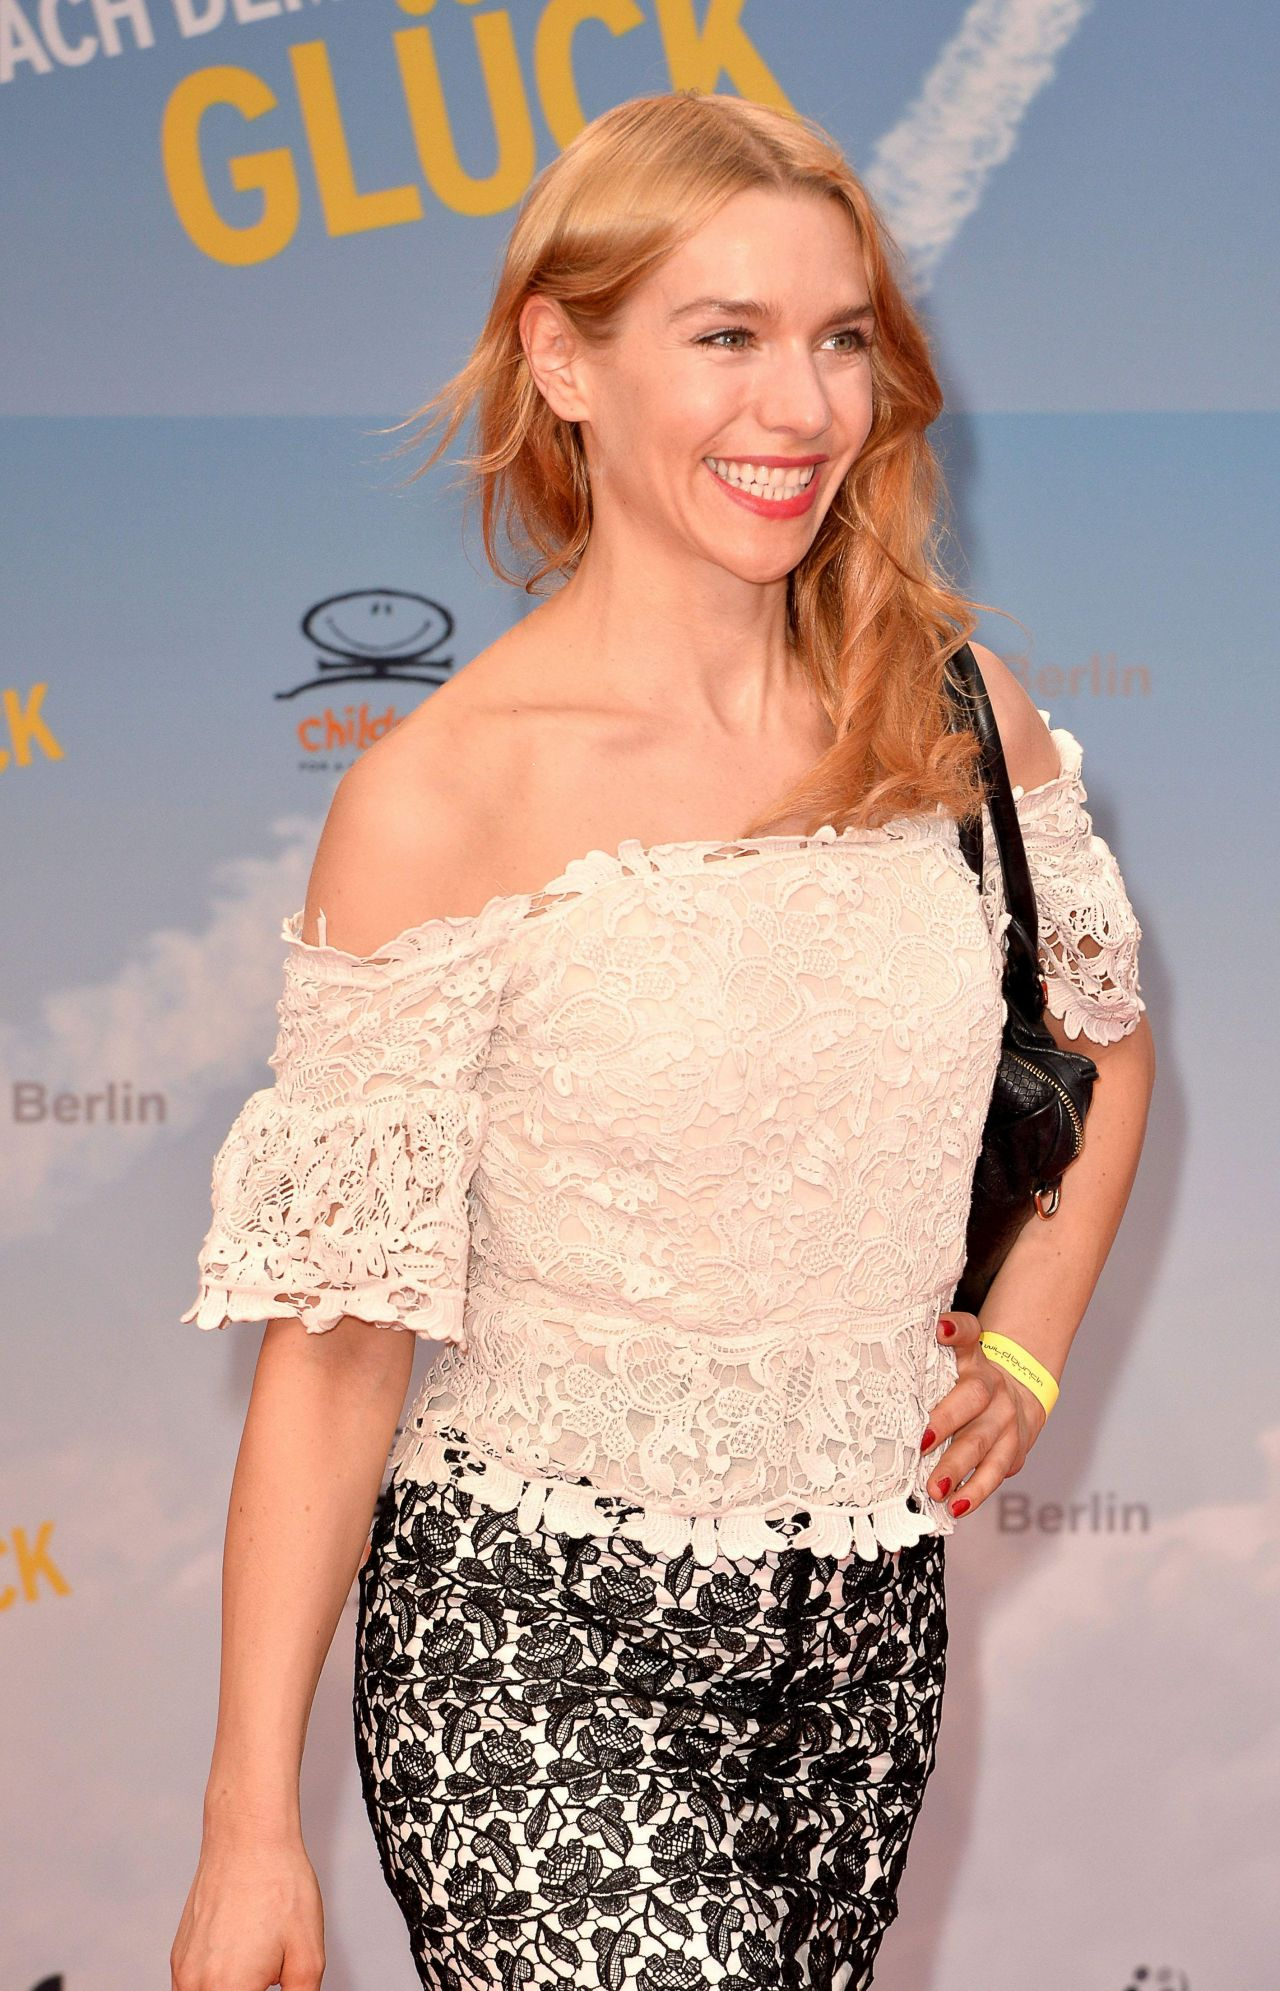 Santa Monica Mercedes >> Julia Dietze - 'Hector's Journey' Movie Premiere in Berlin